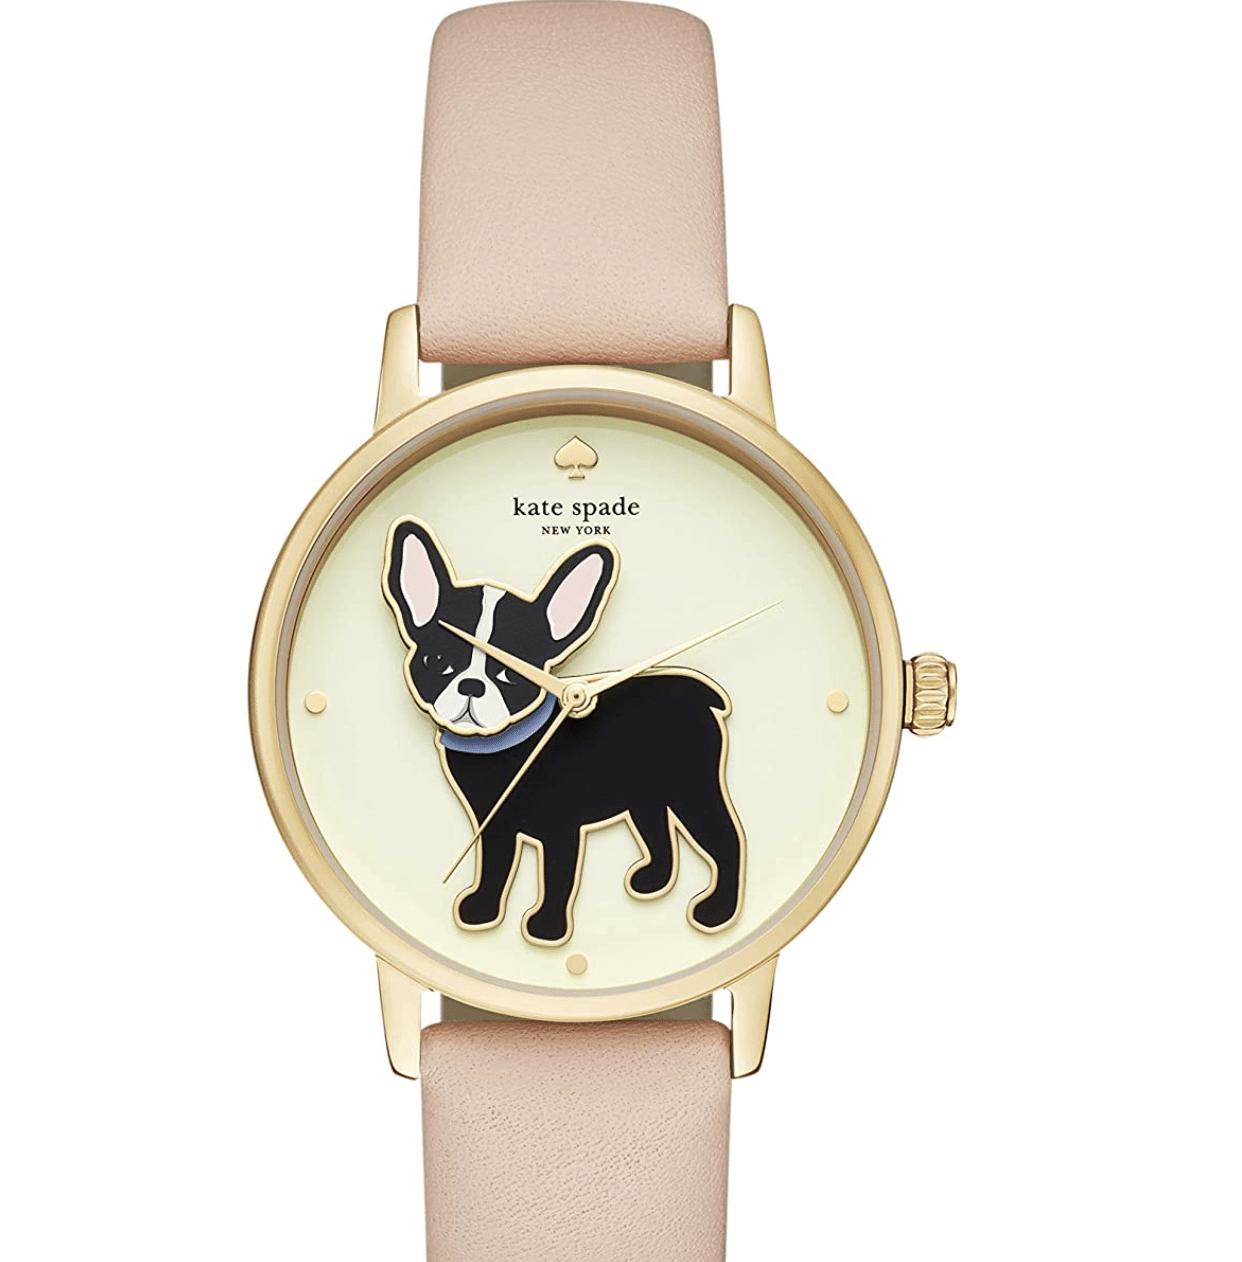 french-bulldog-gifts-watch